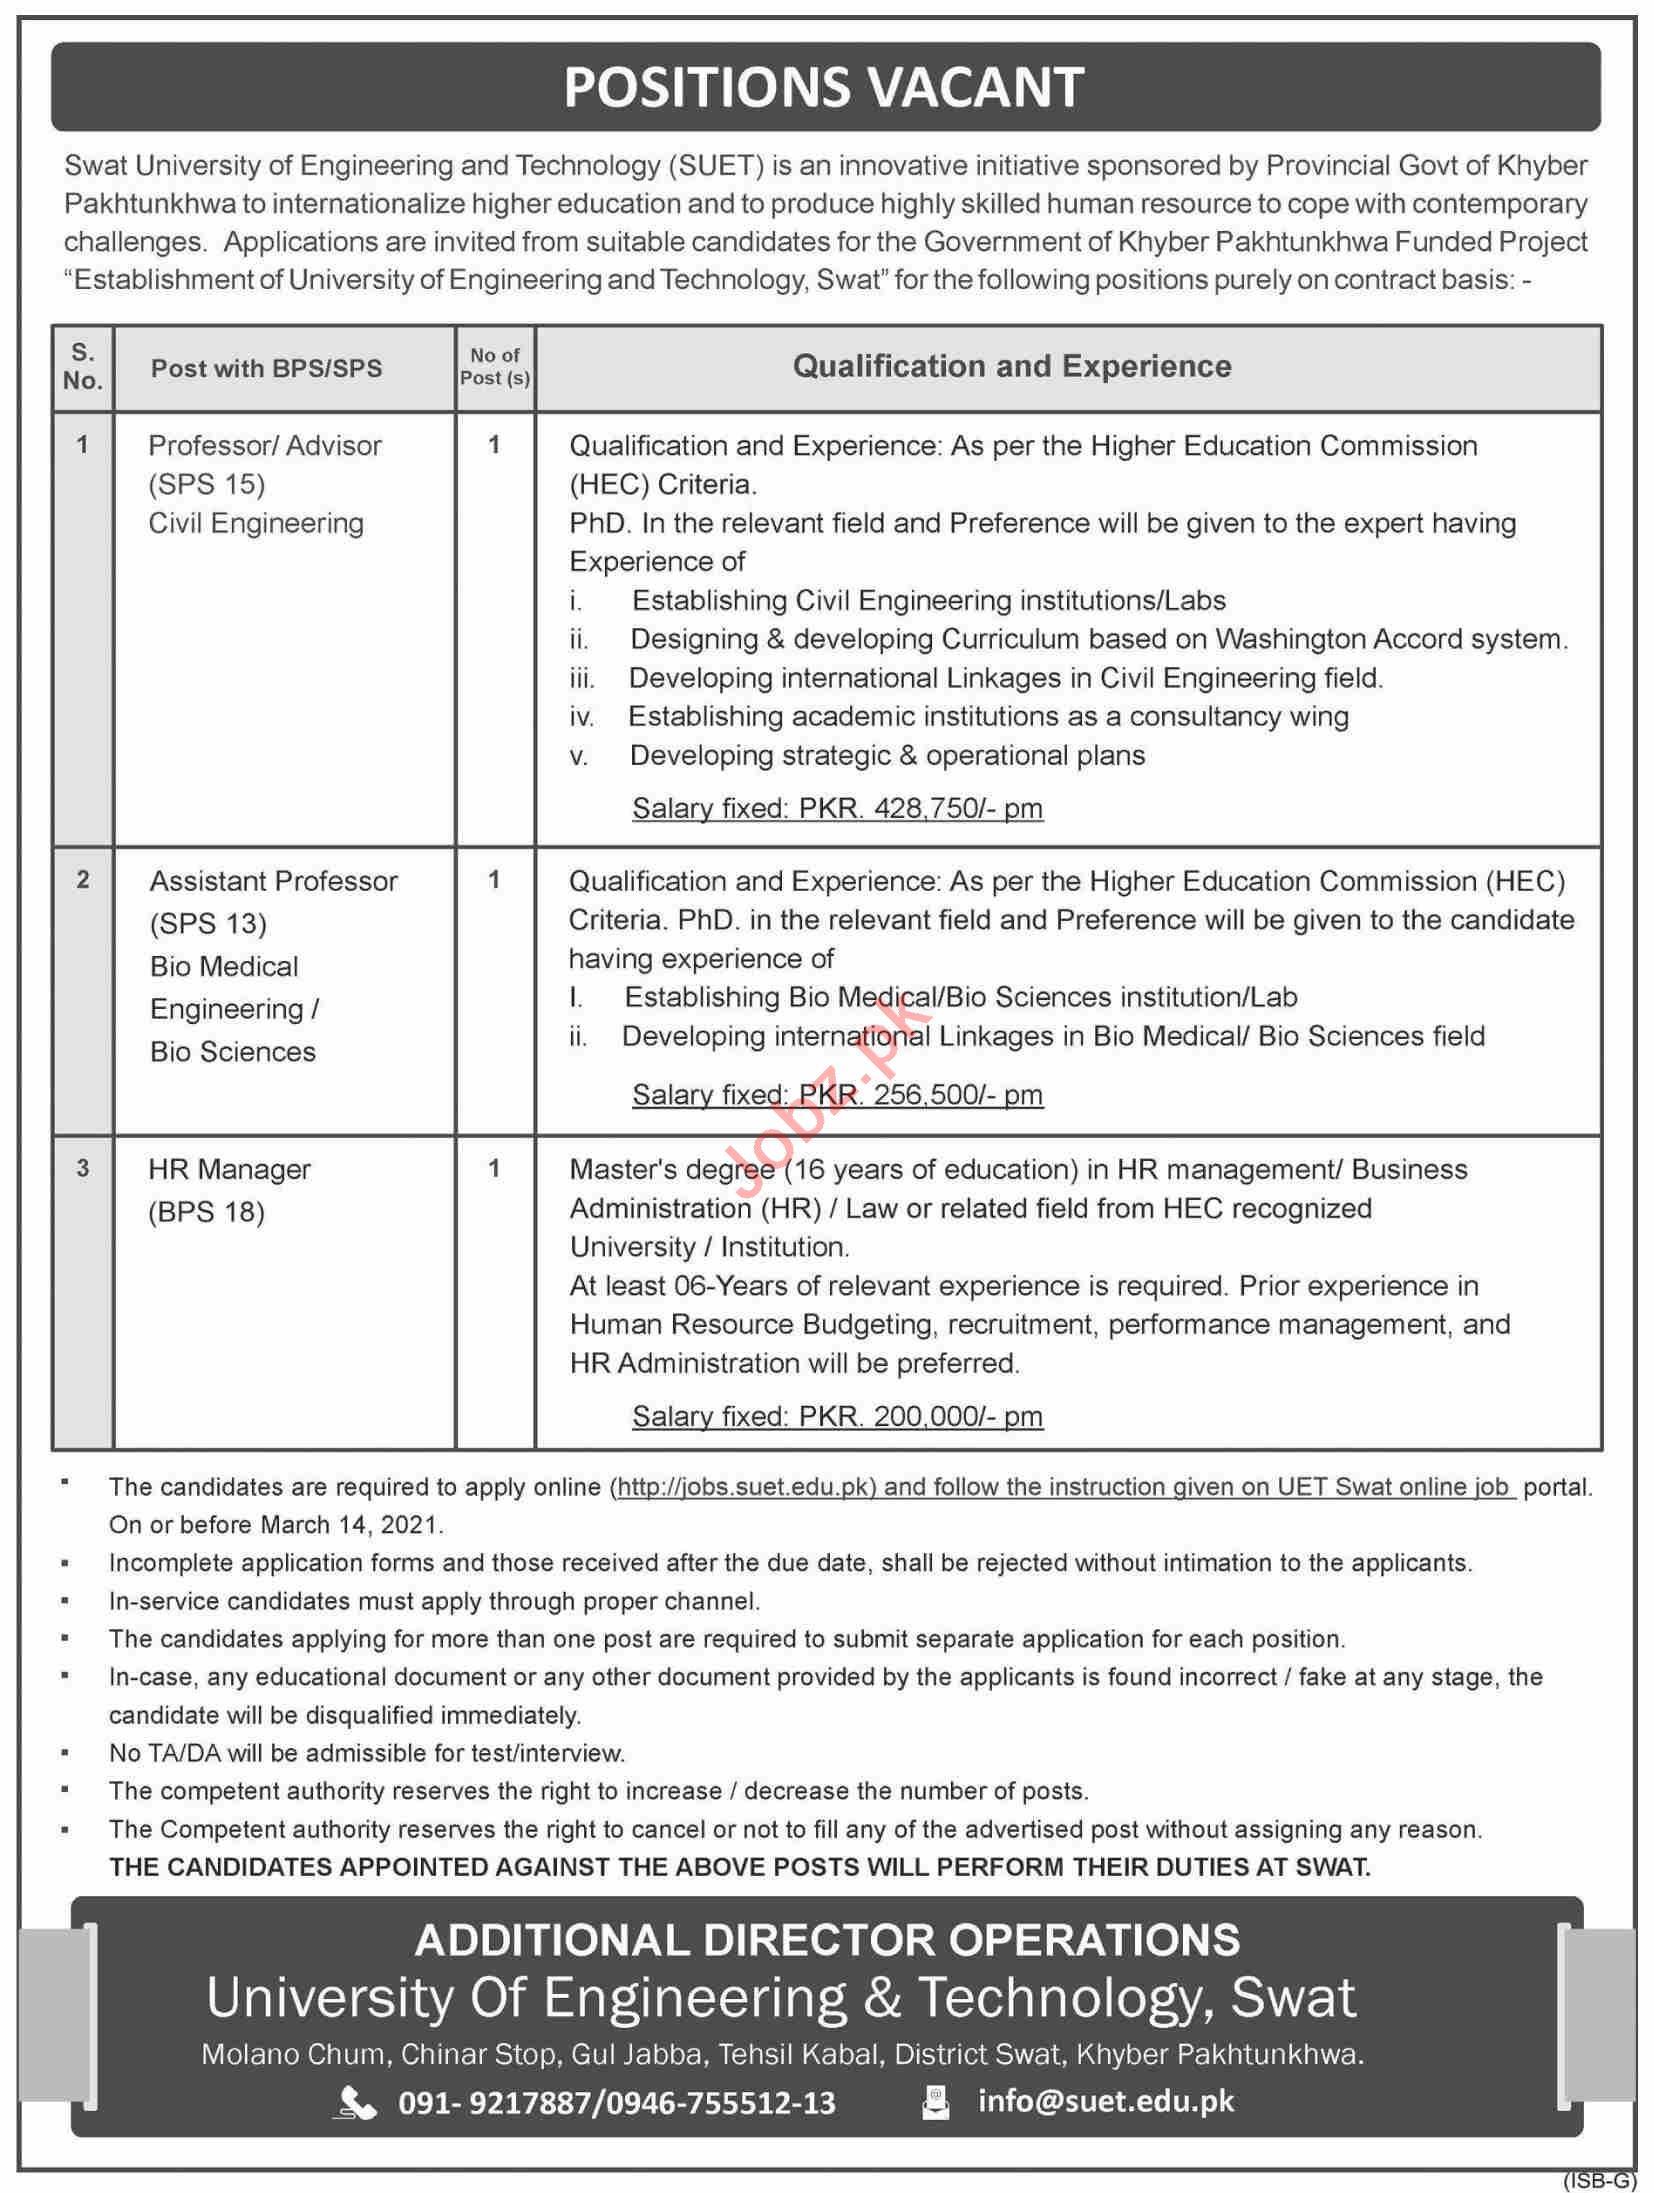 Swat University of Engineering & Technology SUET Jobs 2021